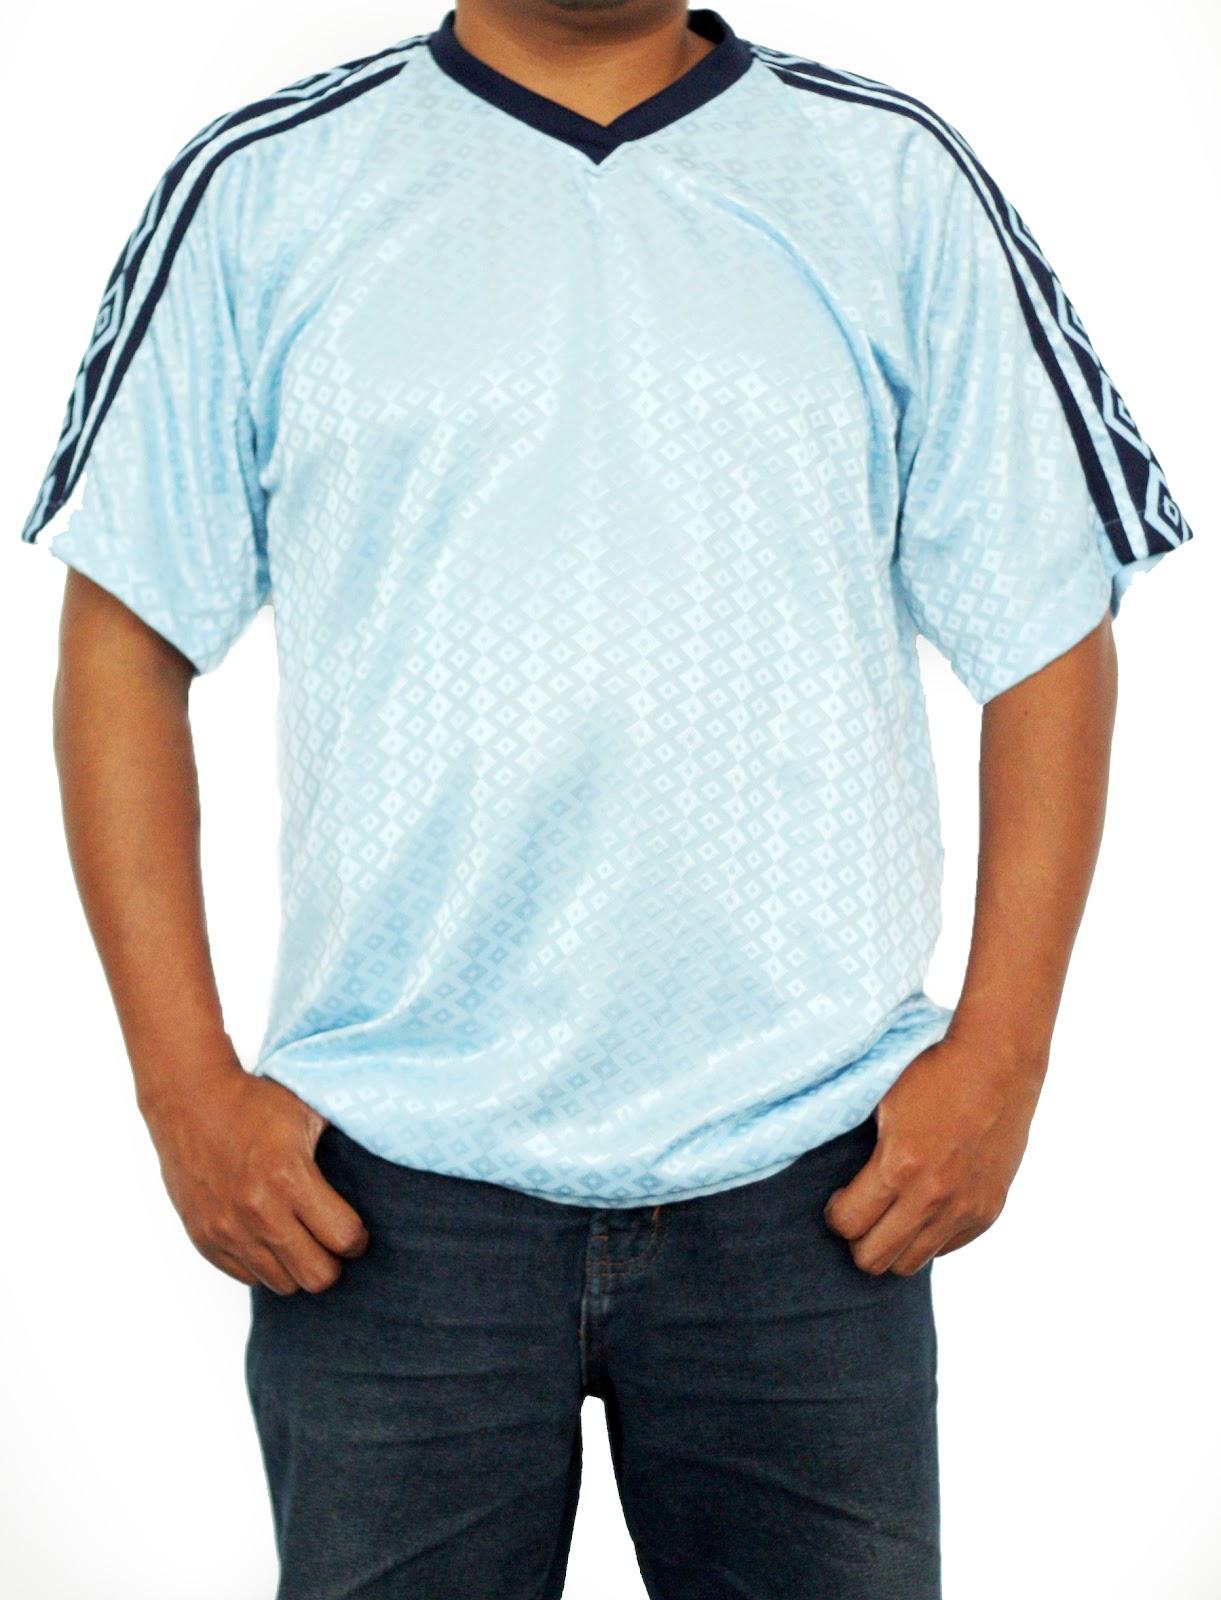 Jual Setelan/Kostum Kiper Futsal & Sepak Bola Anak ...